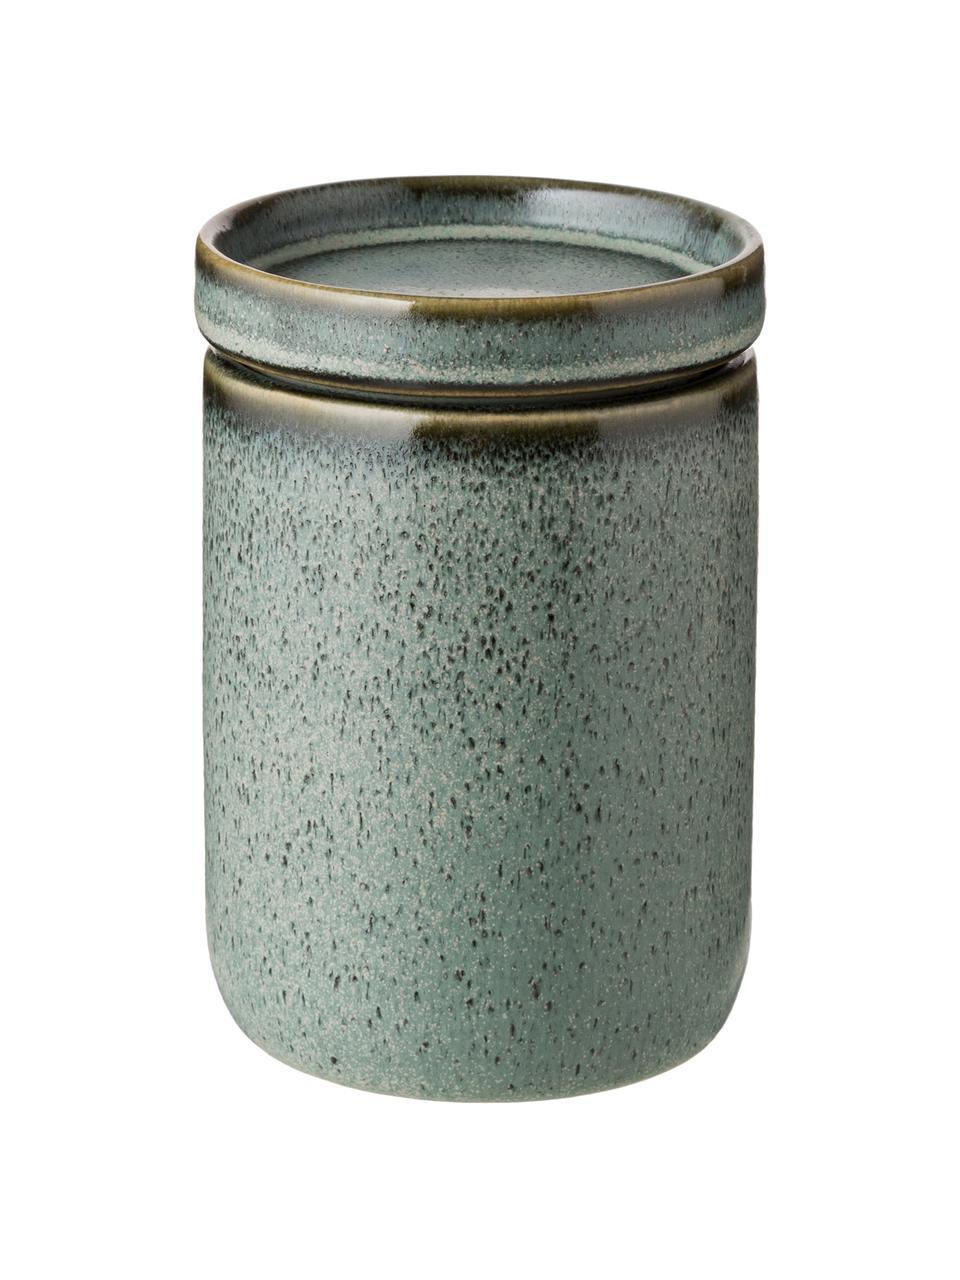 Opbergpot Mila, Geglazuurd keramiek, Grijsgroen, Ø 10 x H 11 cm